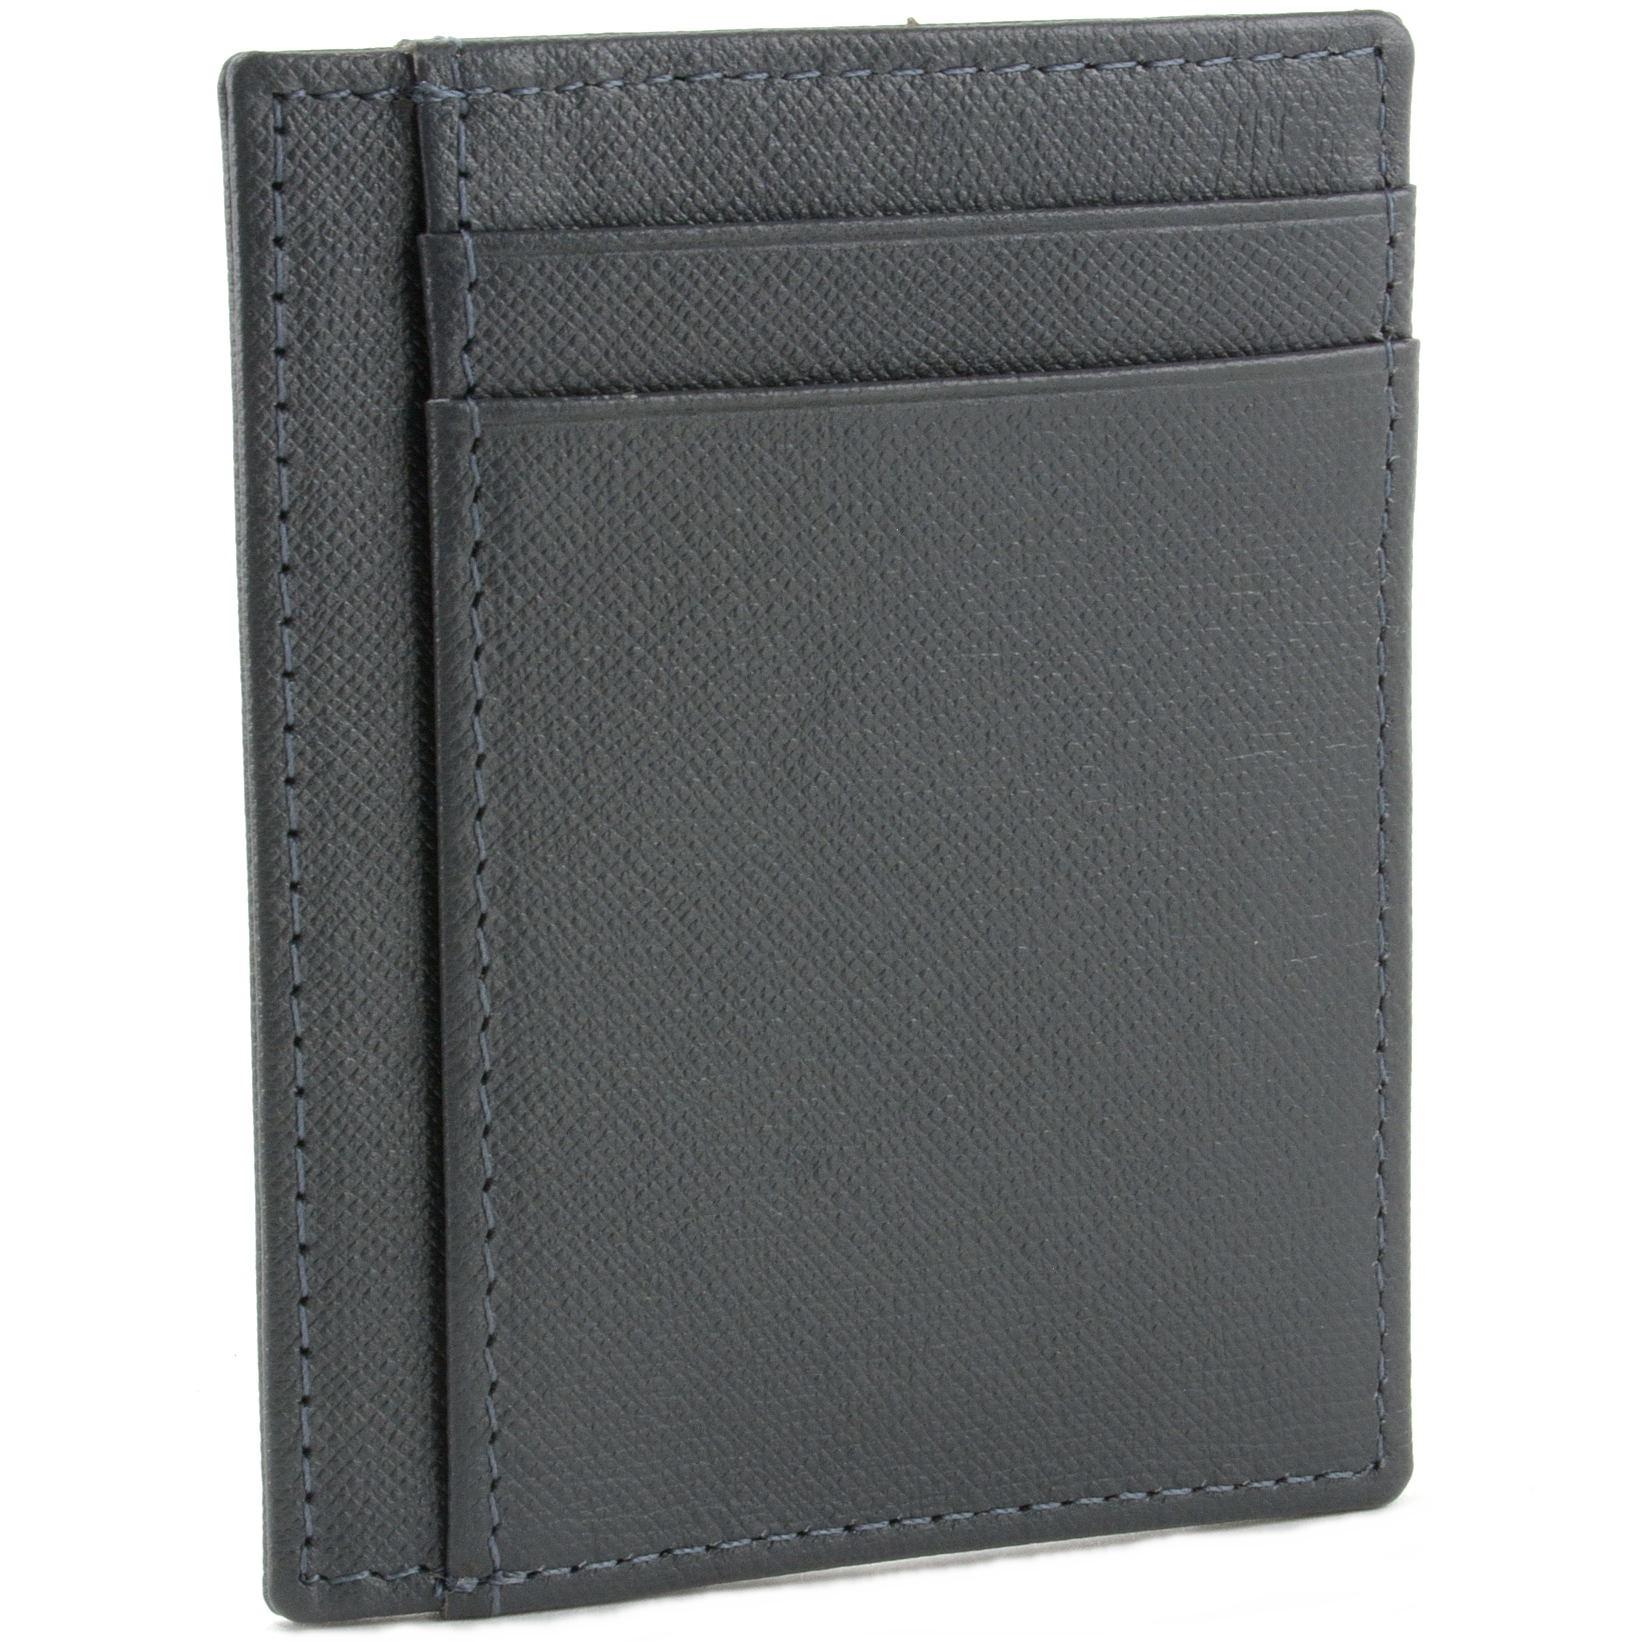 miniature 51 - Hammer-Anvil-Minimalist-Front-Pocket-Wallet-RFID-Blocking-Thin-Leather-Card-Case